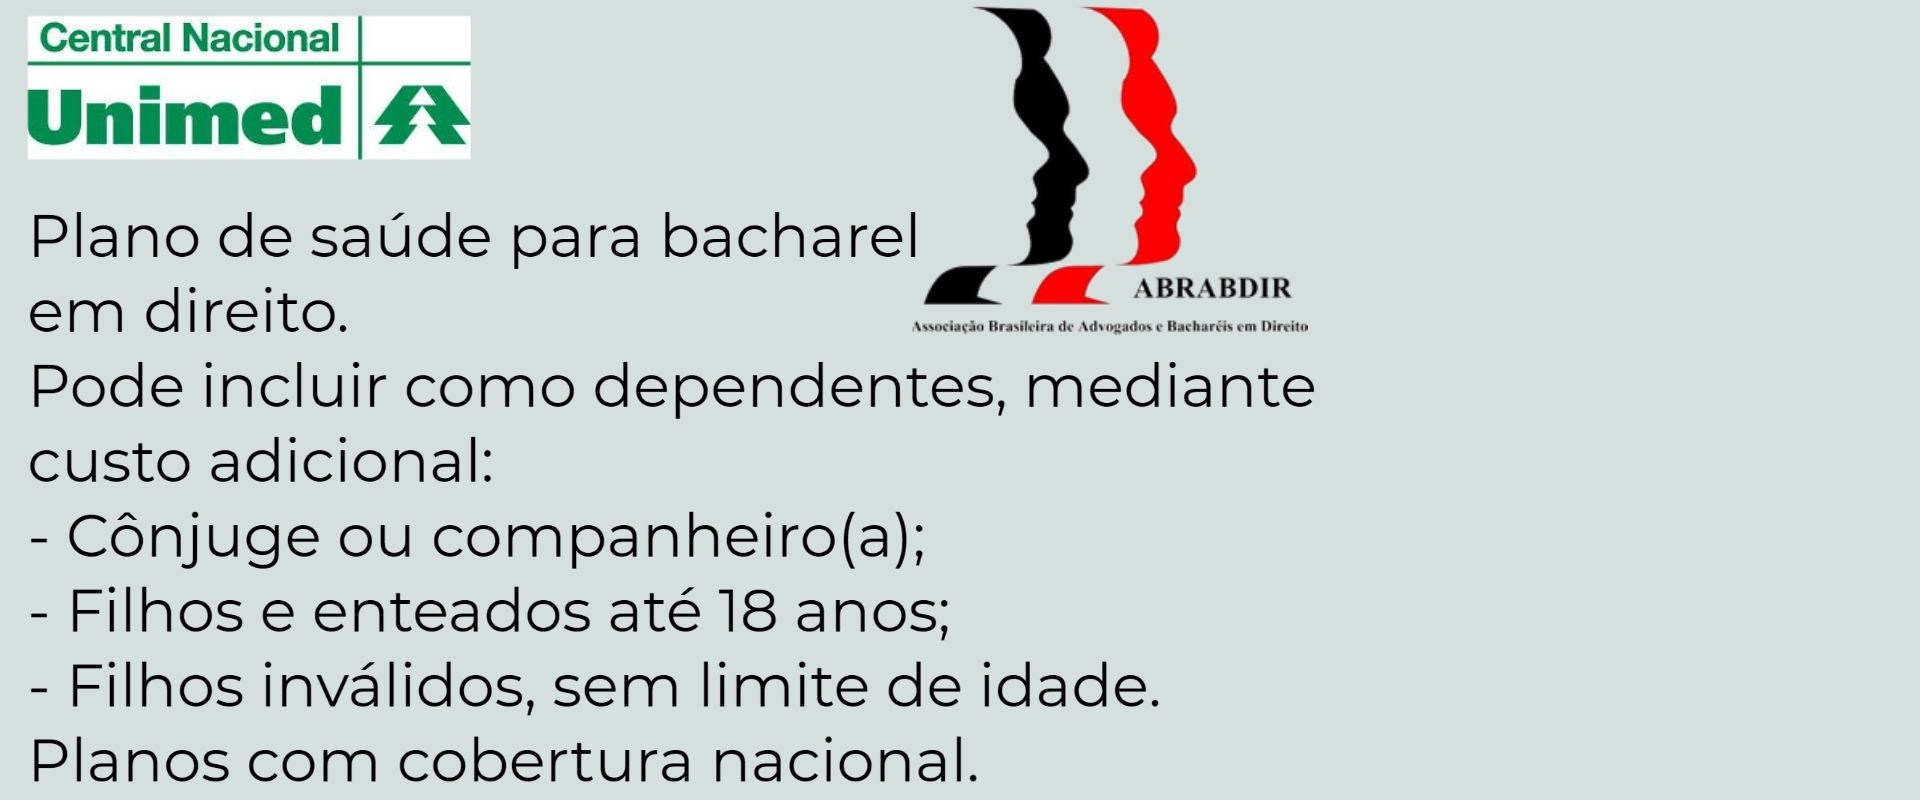 Unimed ABRABDIR Tatuí